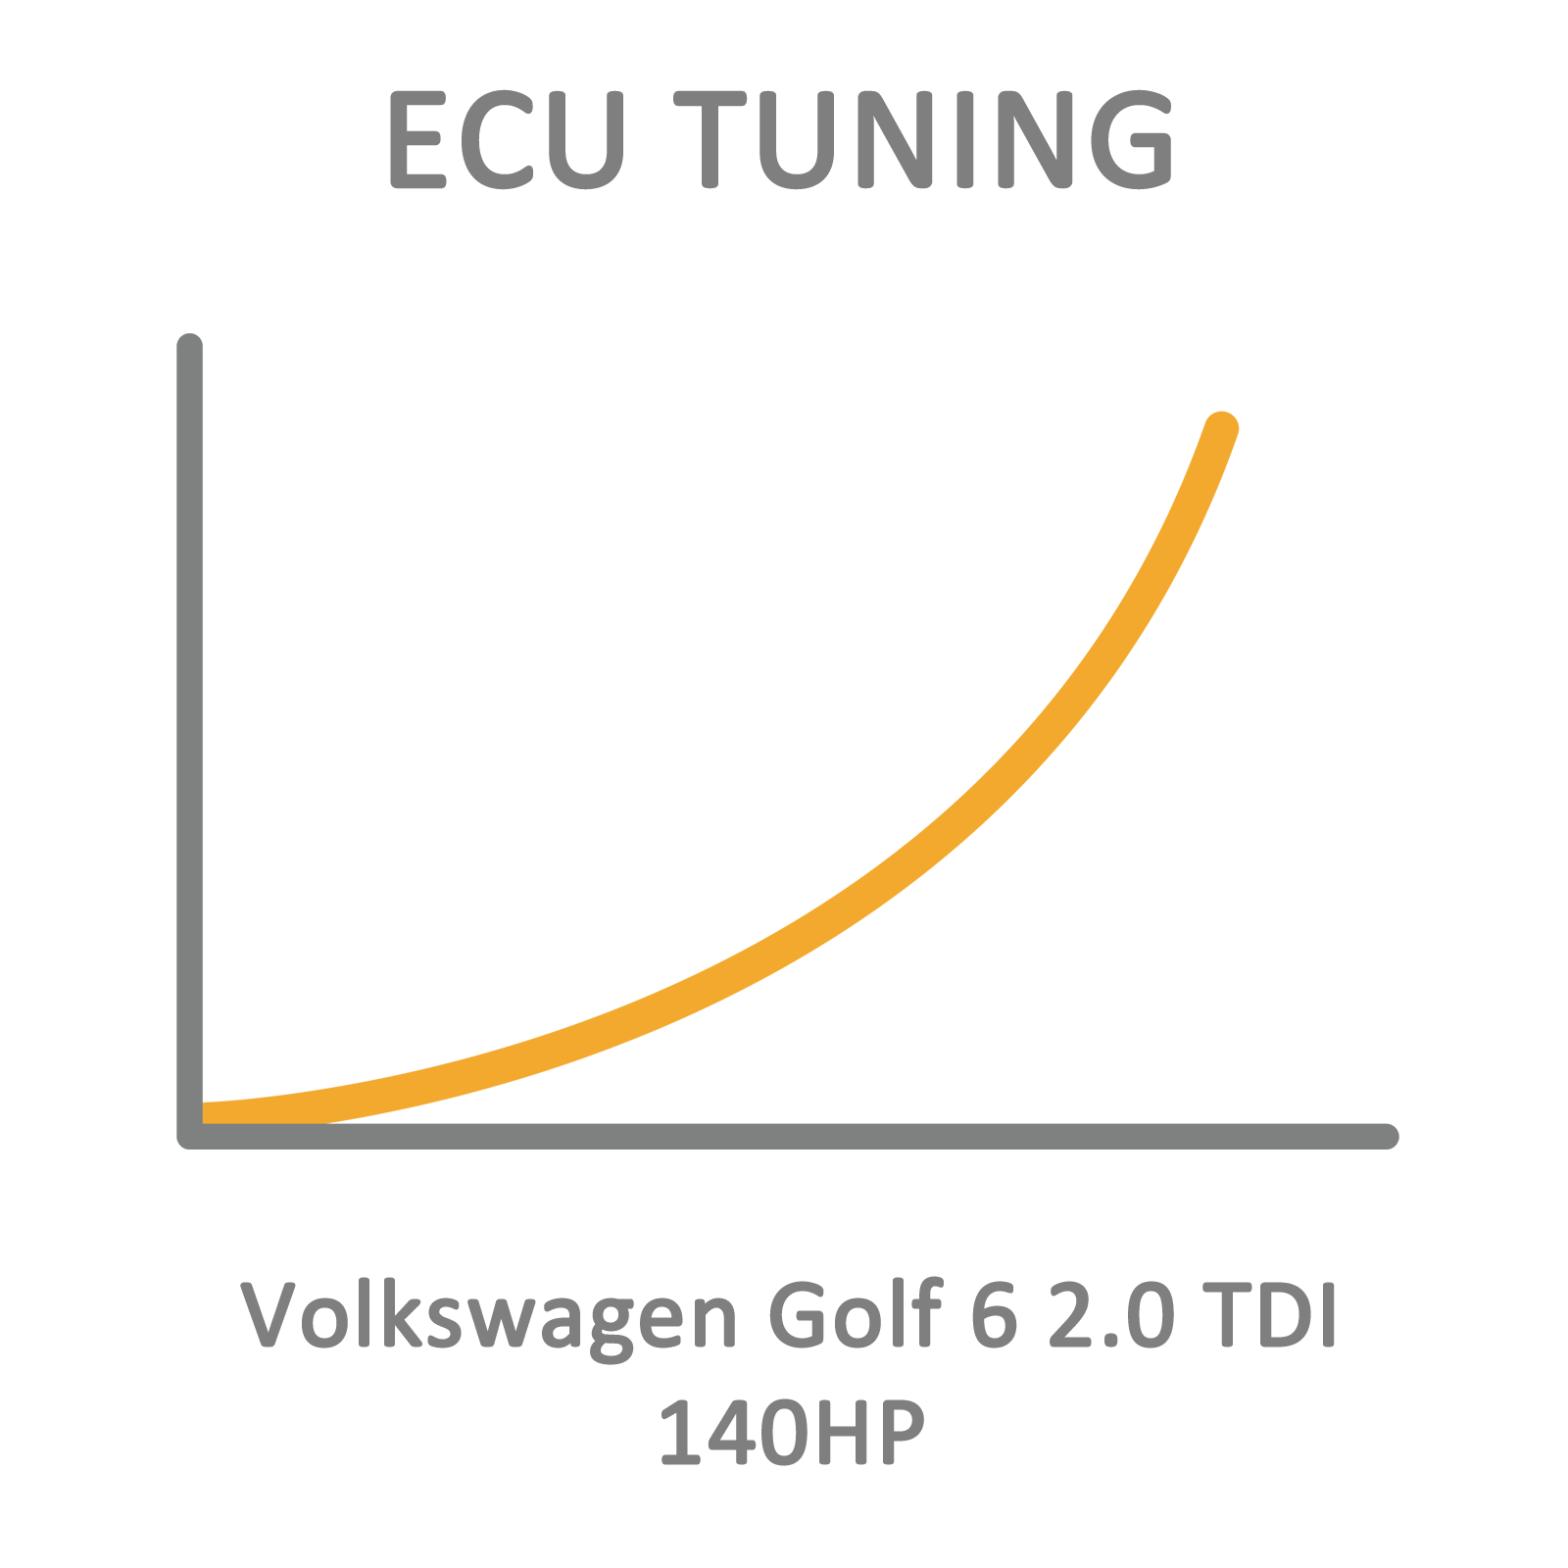 Volkswagen Golf 6 2.0 TDI 140HP ECU Tuning Remapping